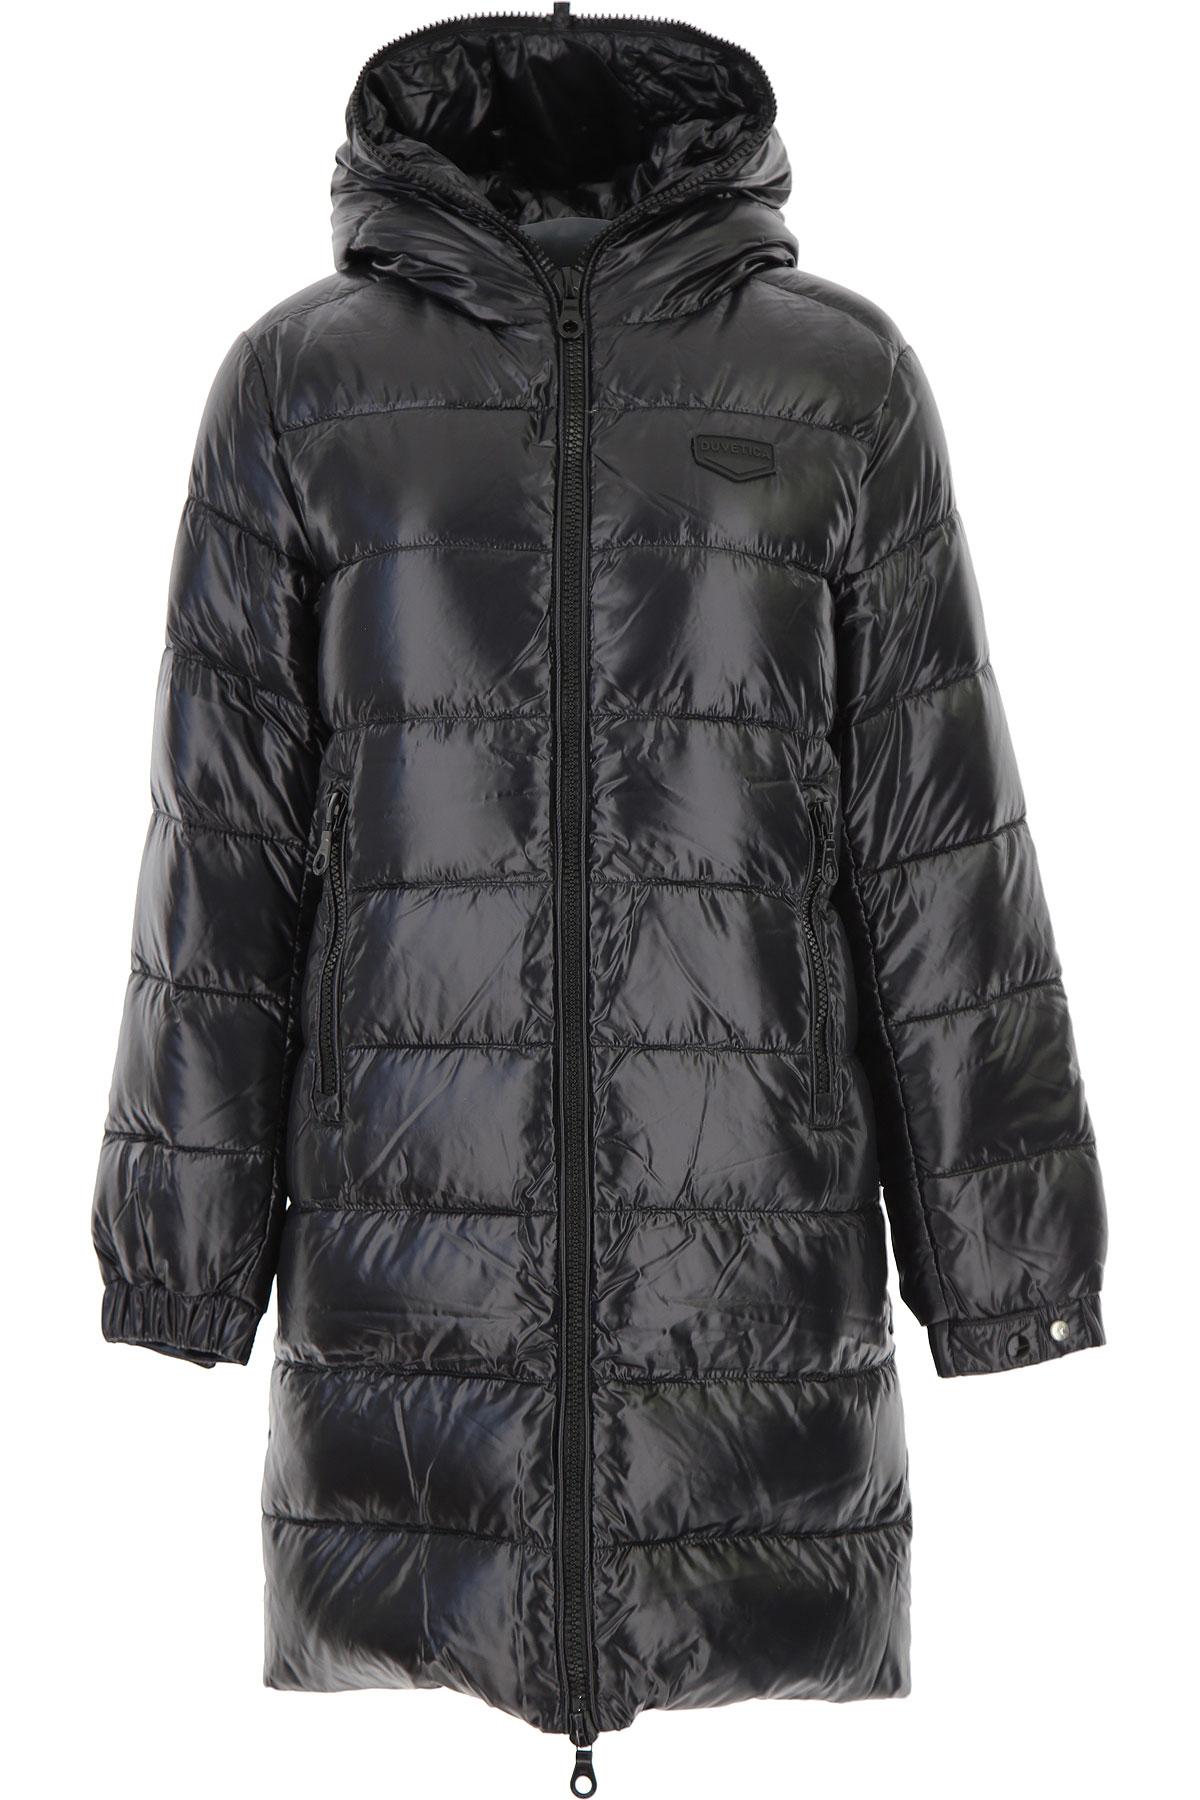 Duvetica Down Jacket for Women, Puffer Ski Jacket On Sale, Black, Down, 2019, 2 4 8